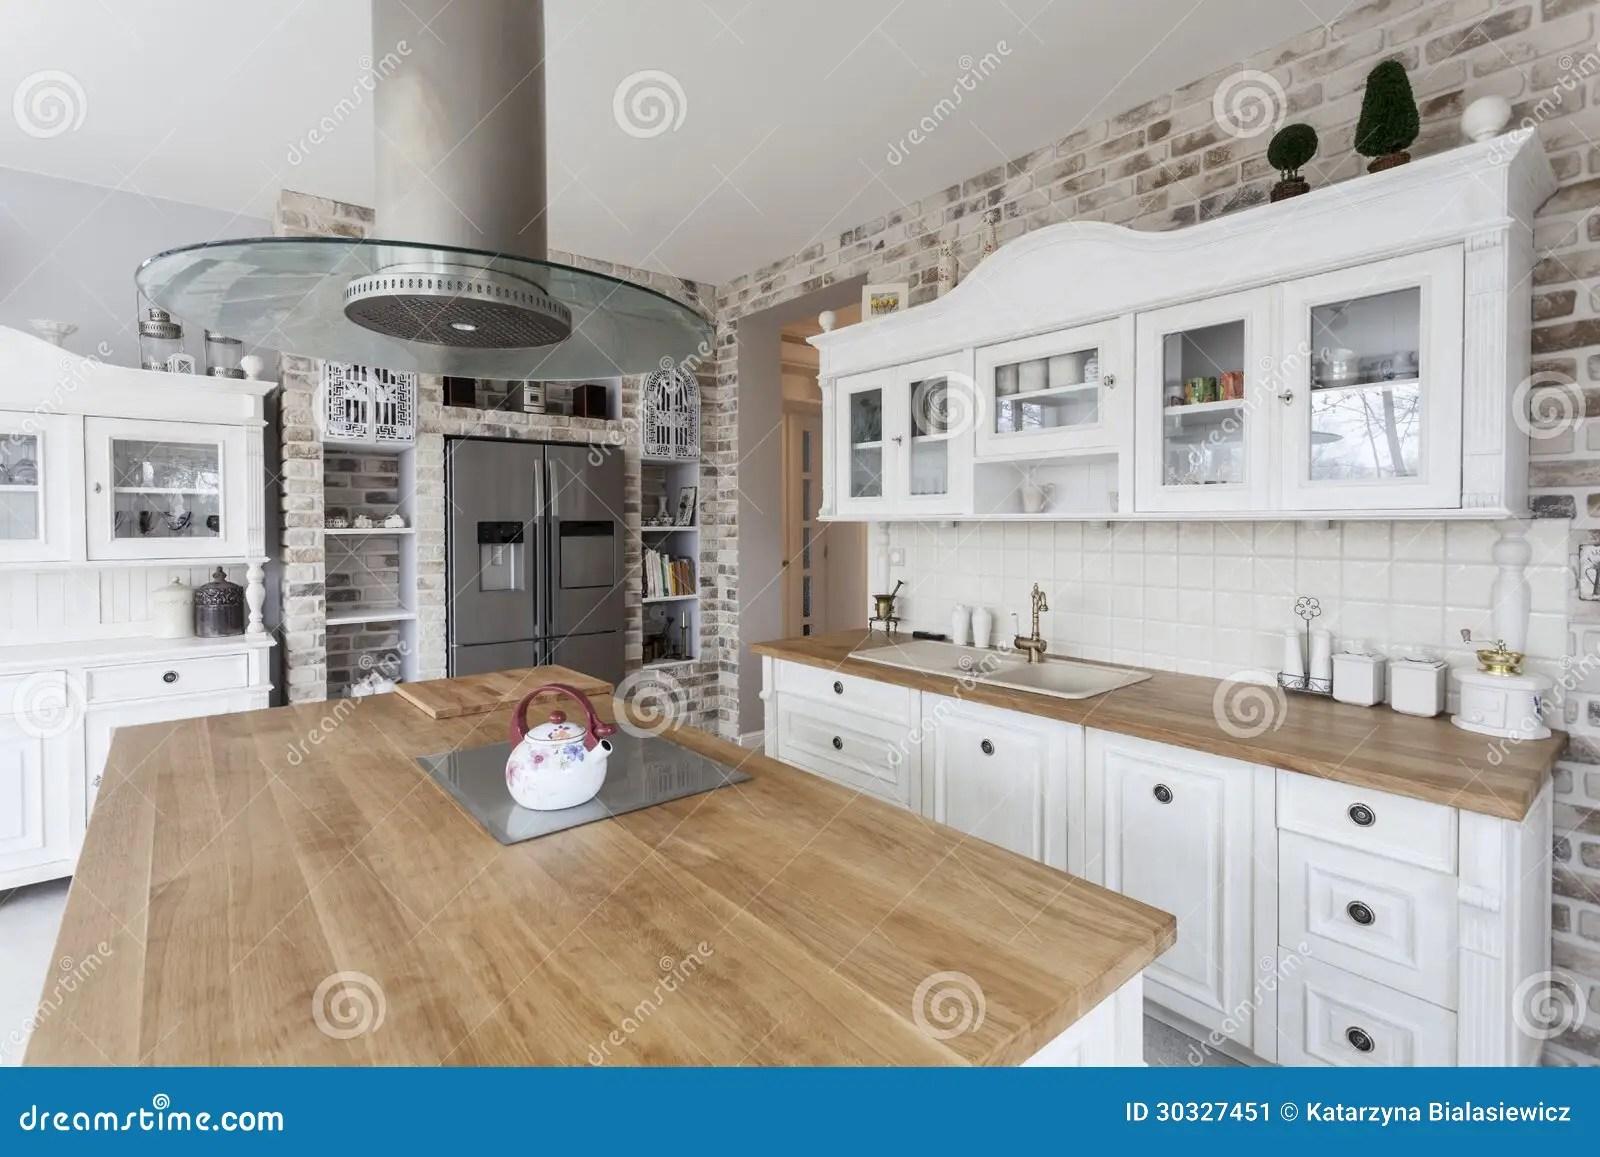 tuscany kitchen faucet subway tile backsplash 托斯卡纳 厨房架子库存图片 图片包括有户内 家具 地中海 国内 厨房架子